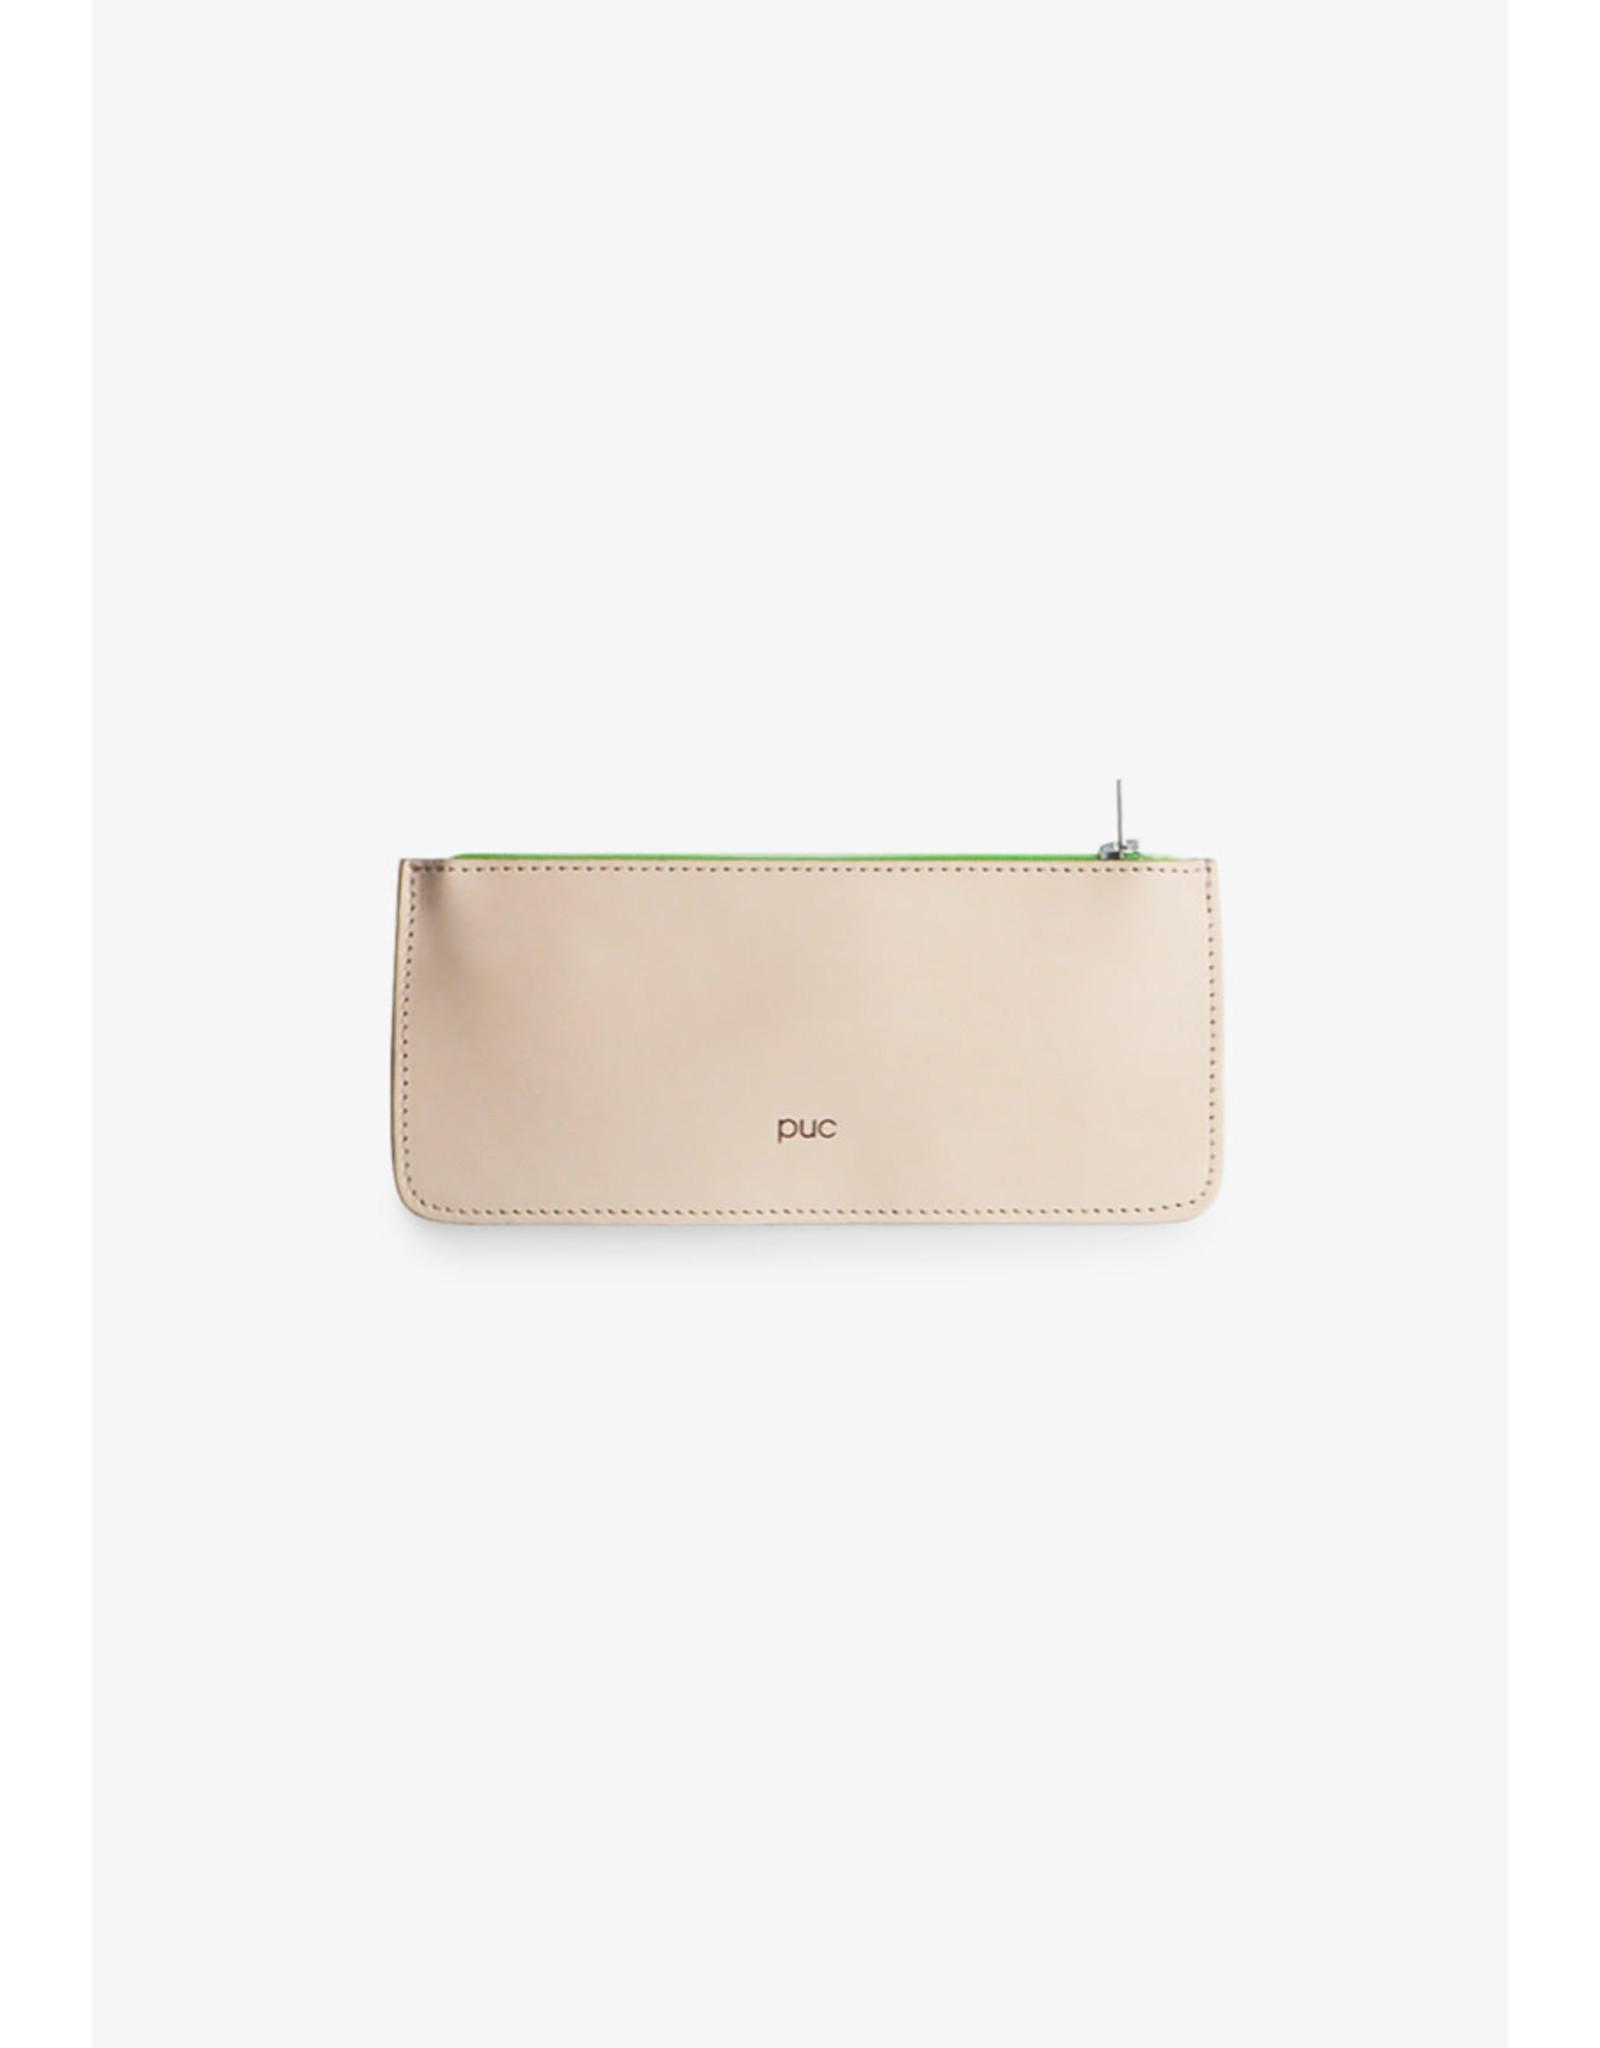 Puc Creative | Nude | Fluor green | 19 x 8,5 cm